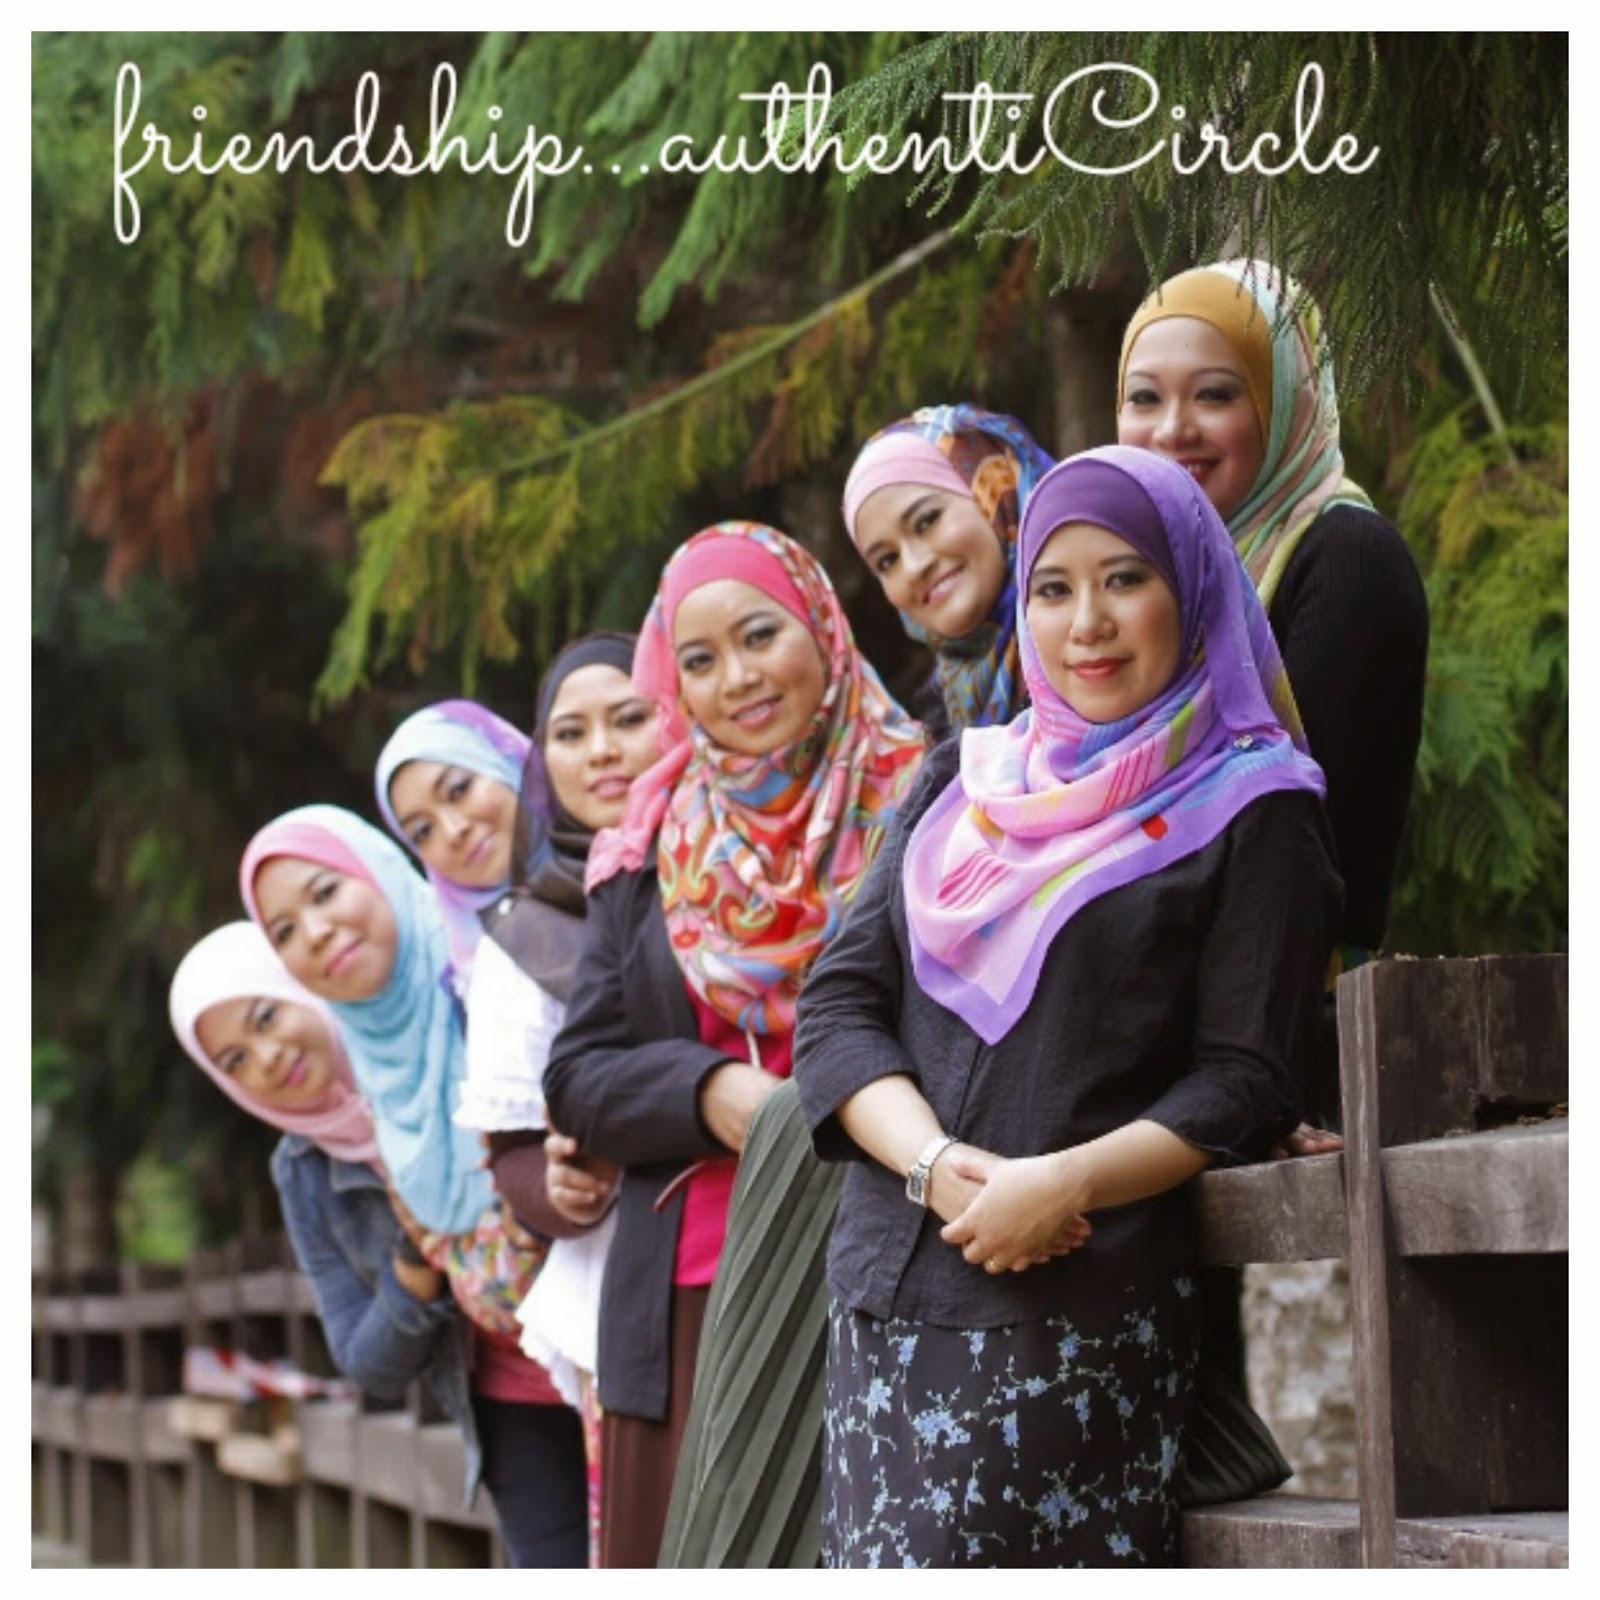 Azniza ARshad, AuthentiCircle, Glampreneurs, Photoshoot, Putrajaya, Usahawan Online, Maisarah Ibrahim